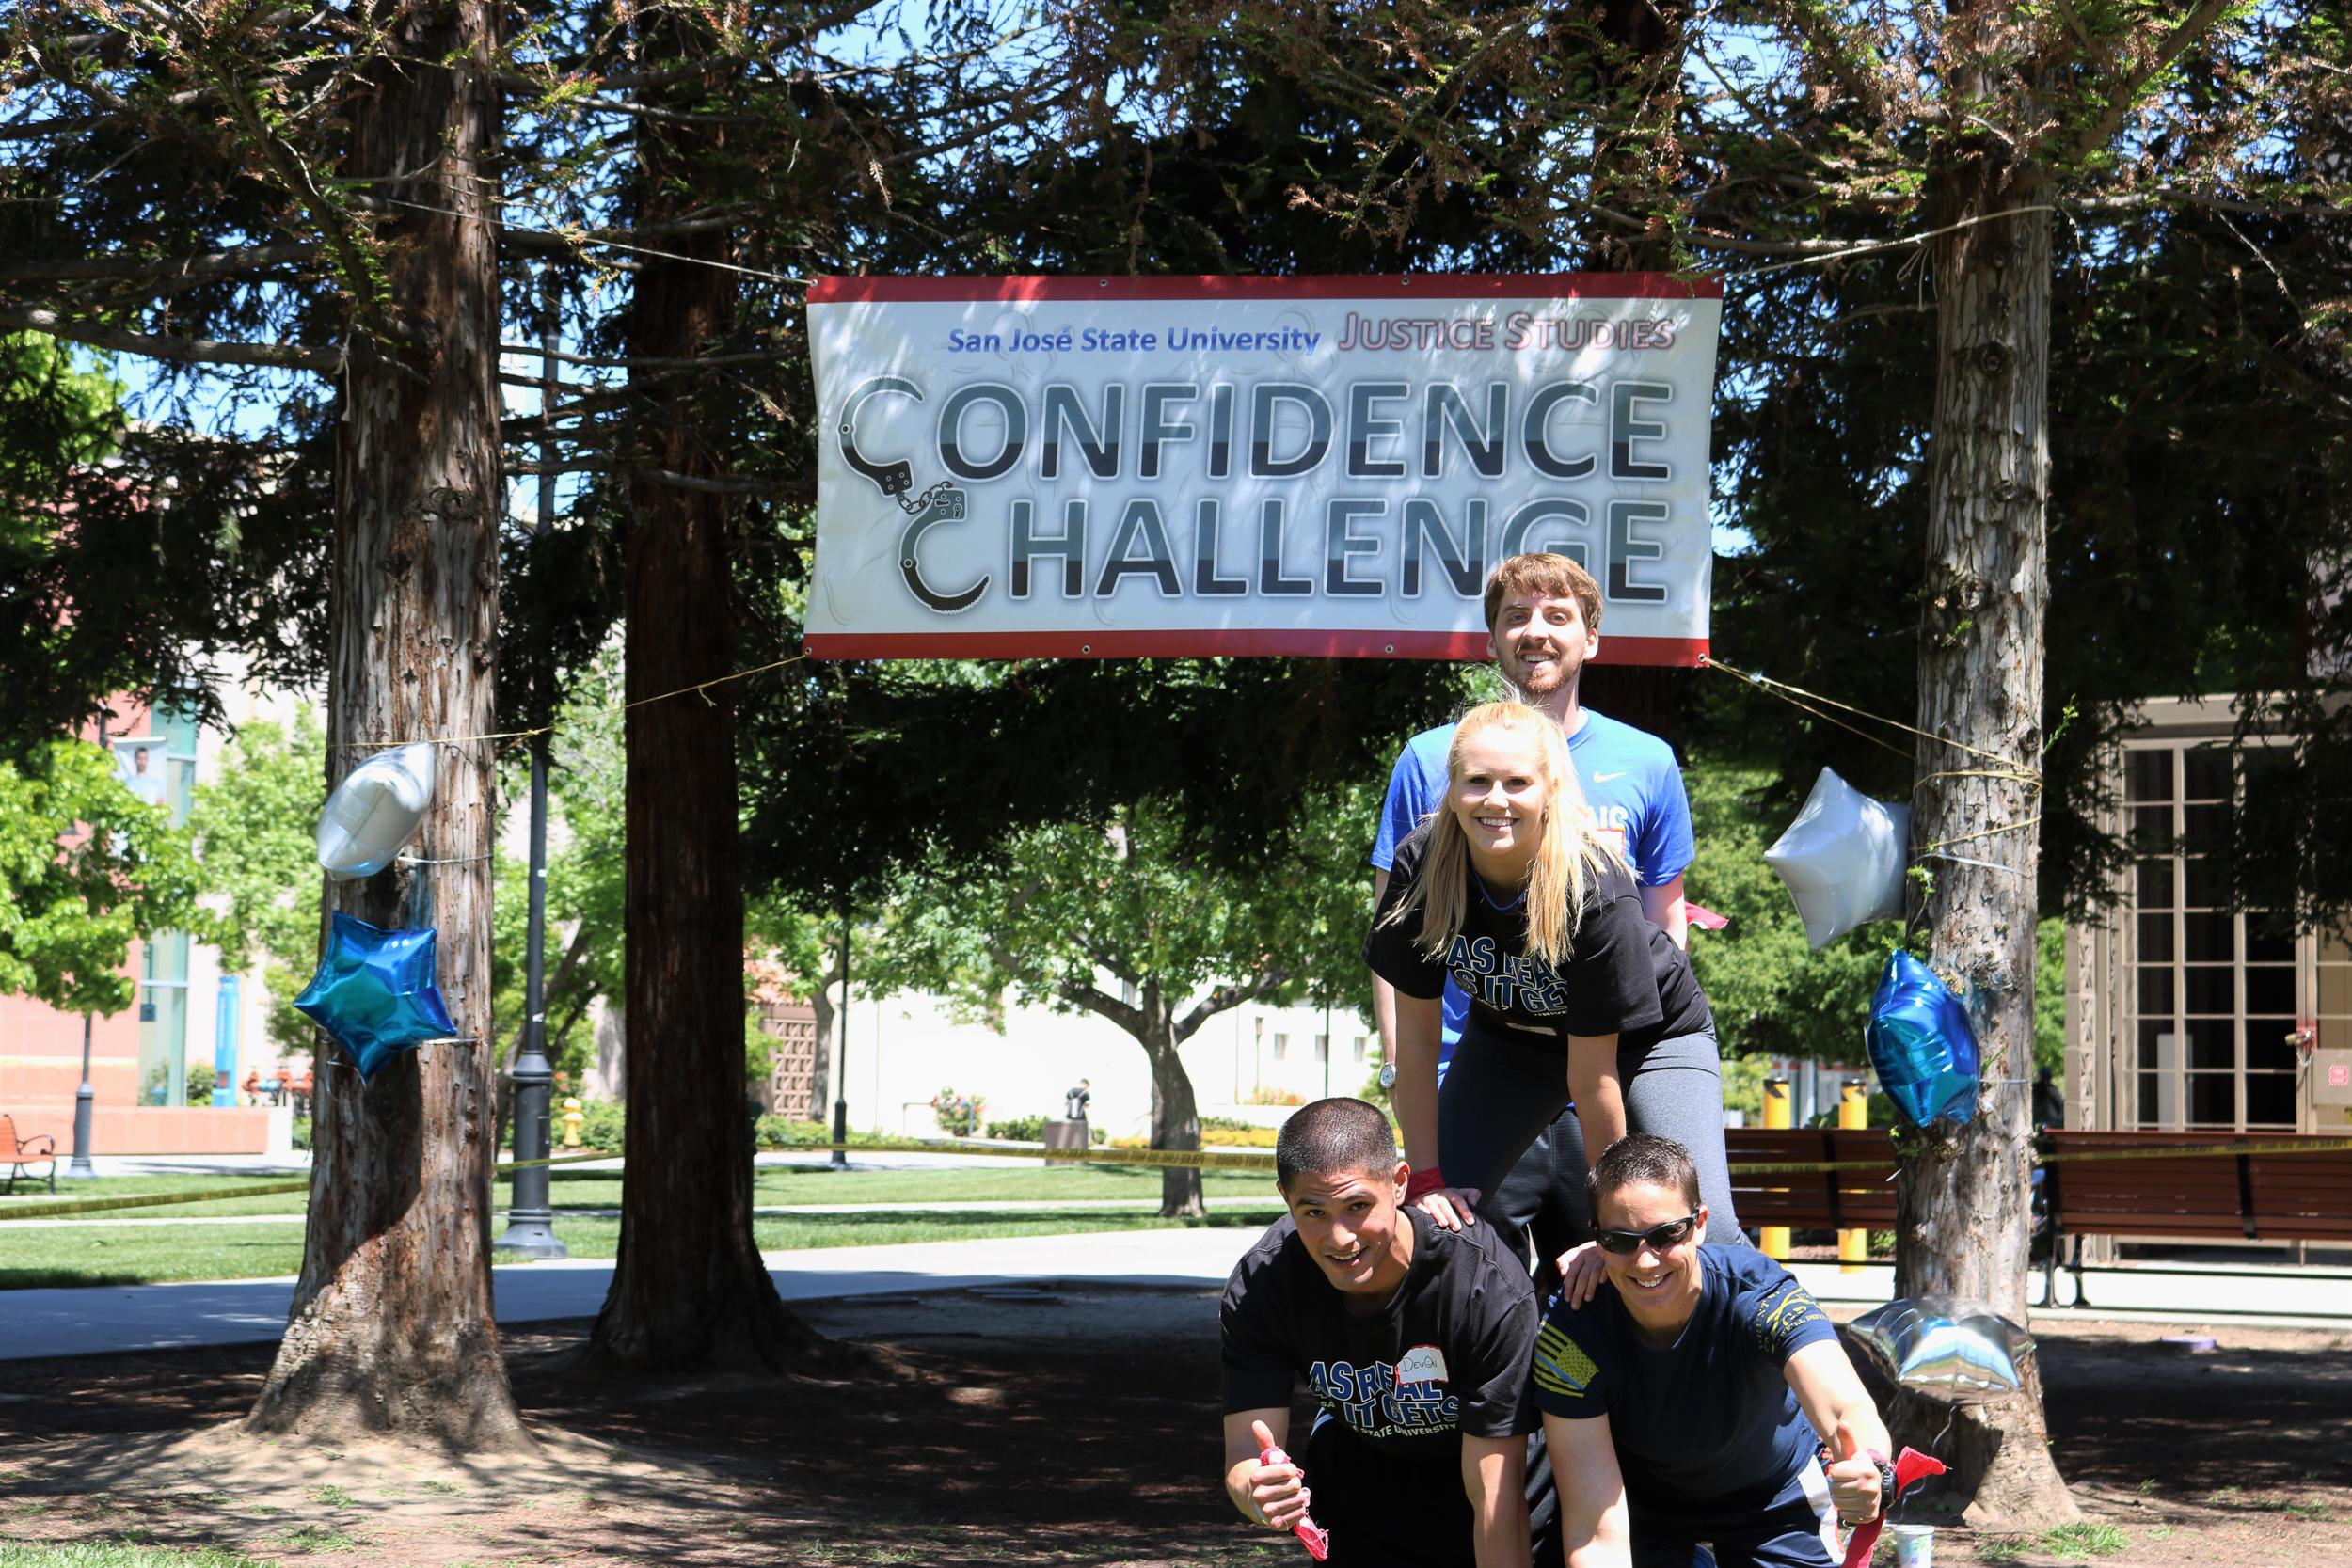 042817_Confidence_Challenge_Kameda-12.jpg